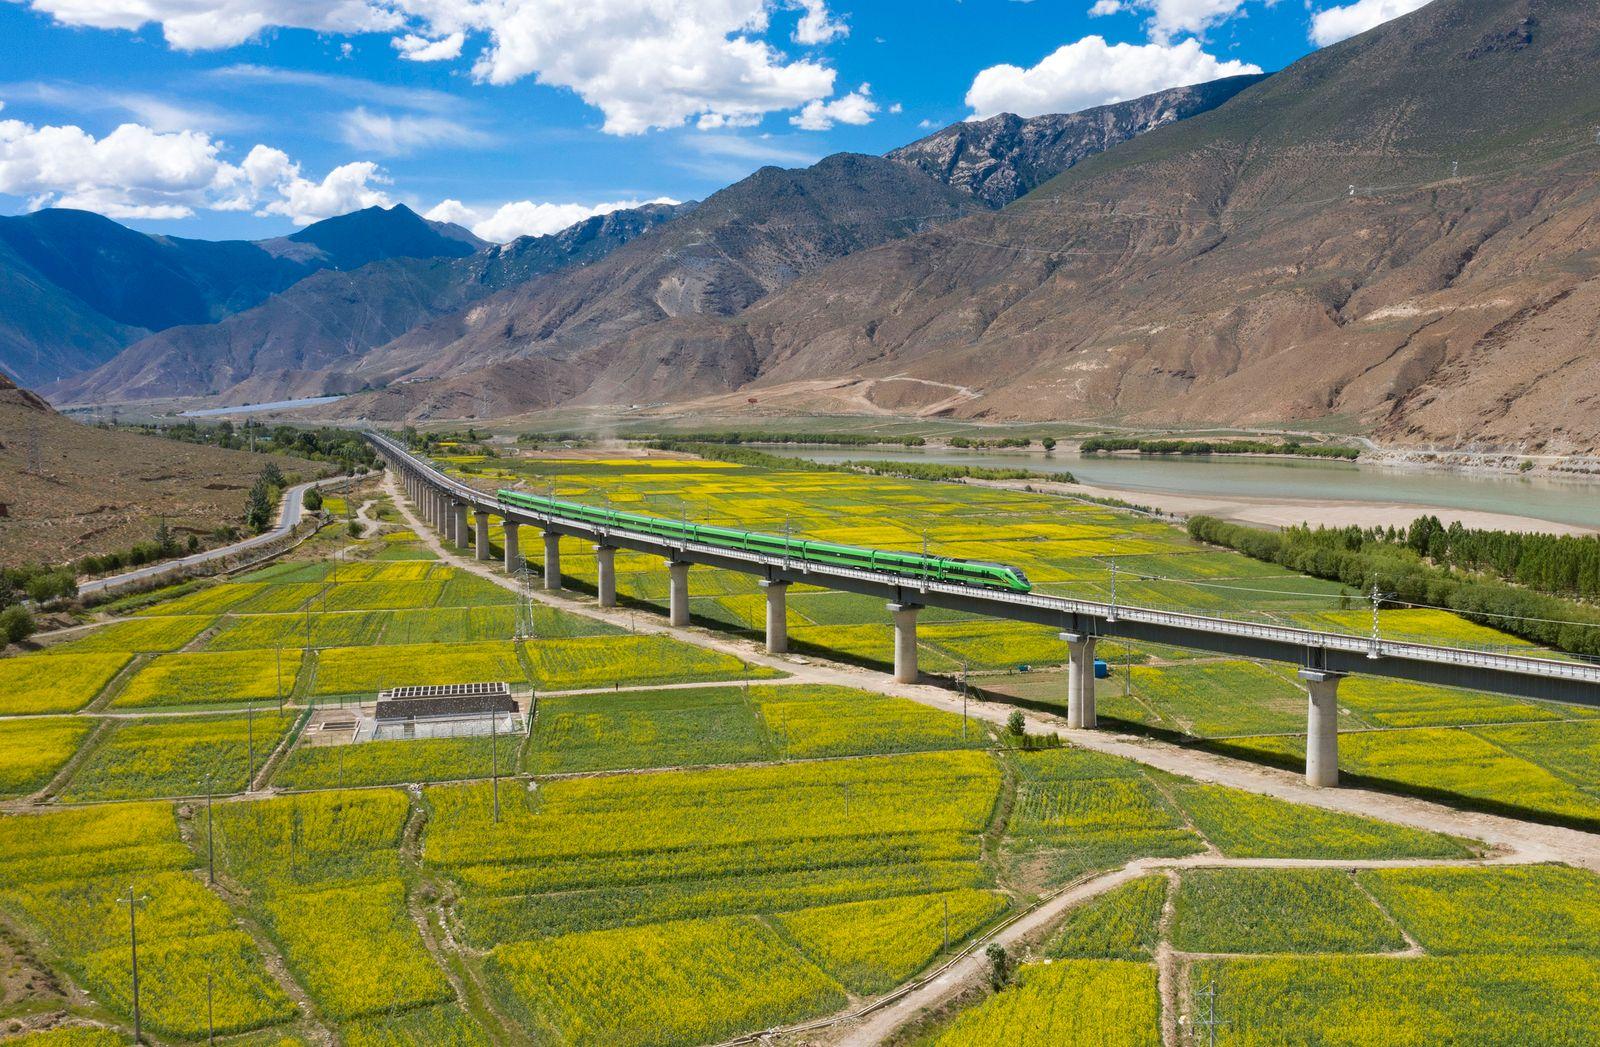 Lhasa-Nyingchi Railway Opens To Traffic In Tibet